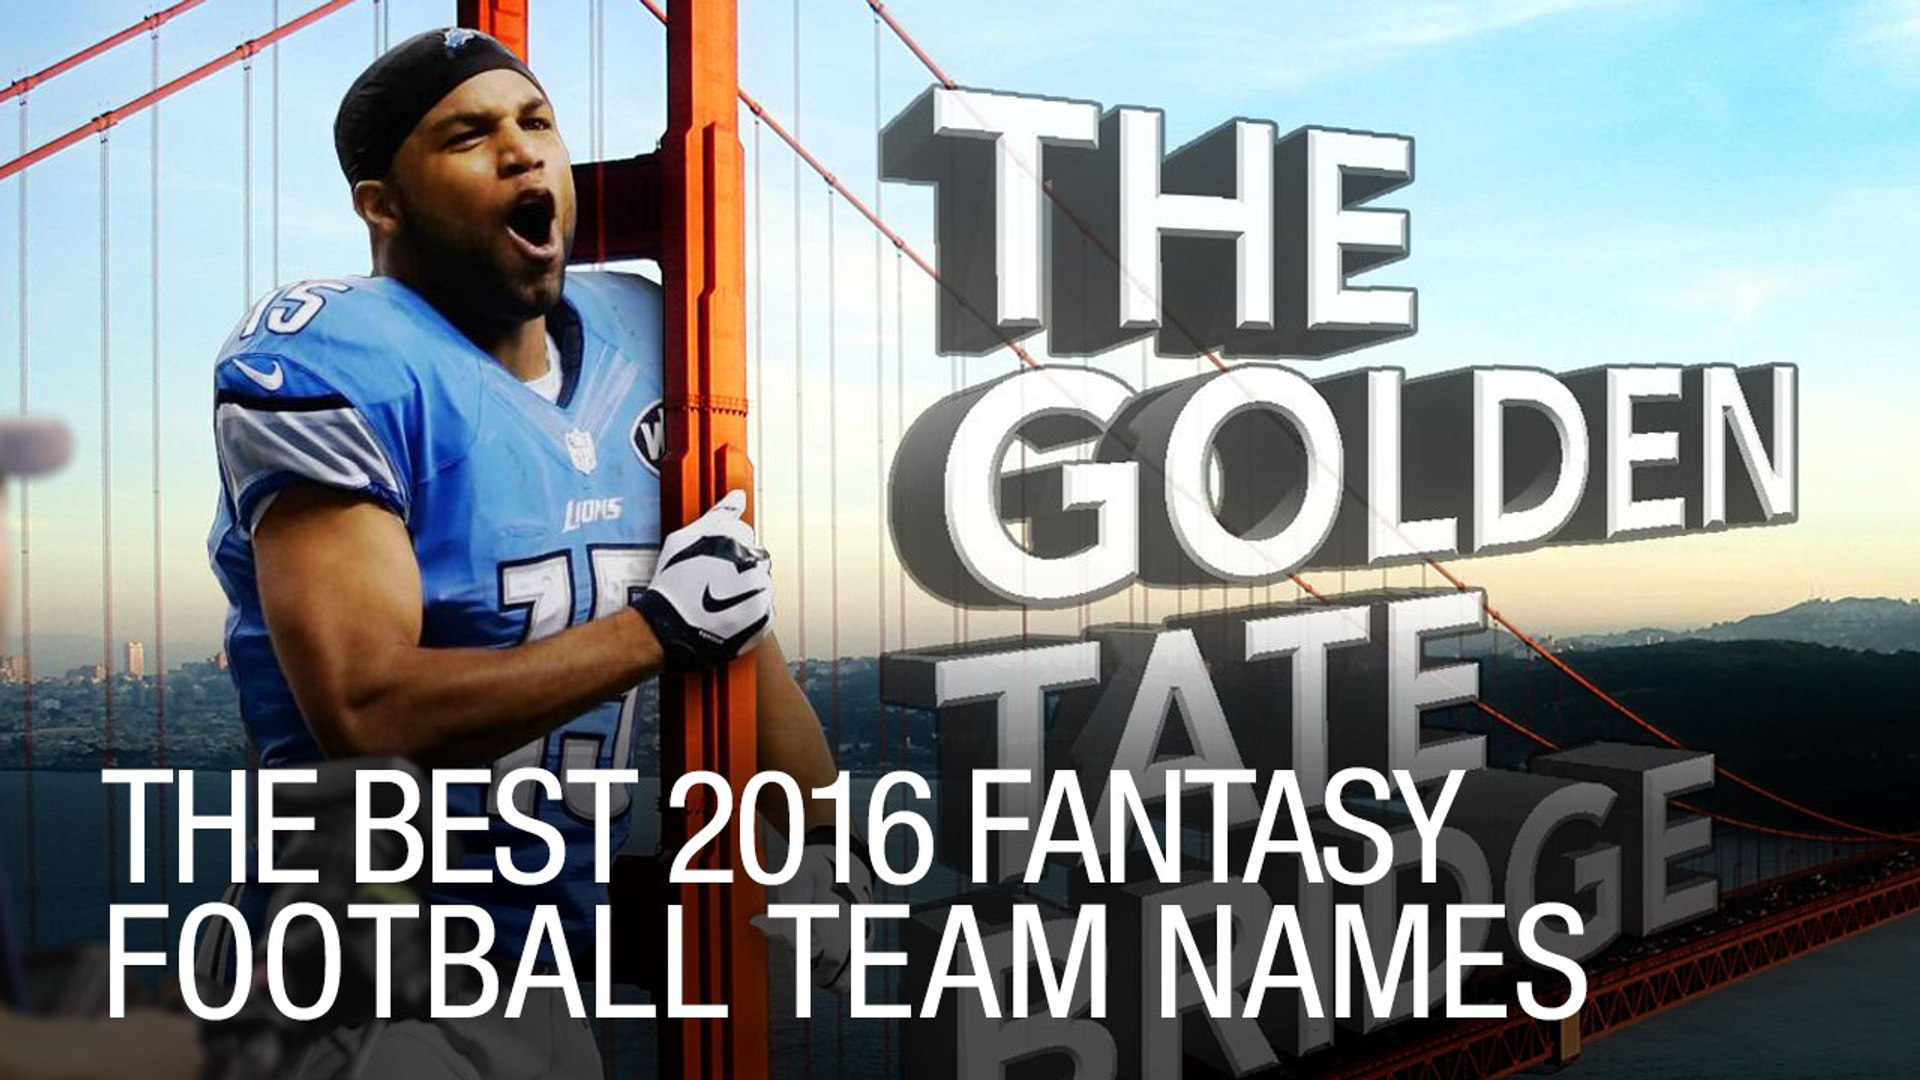 The Best 2016 Fantasy Football Team Names